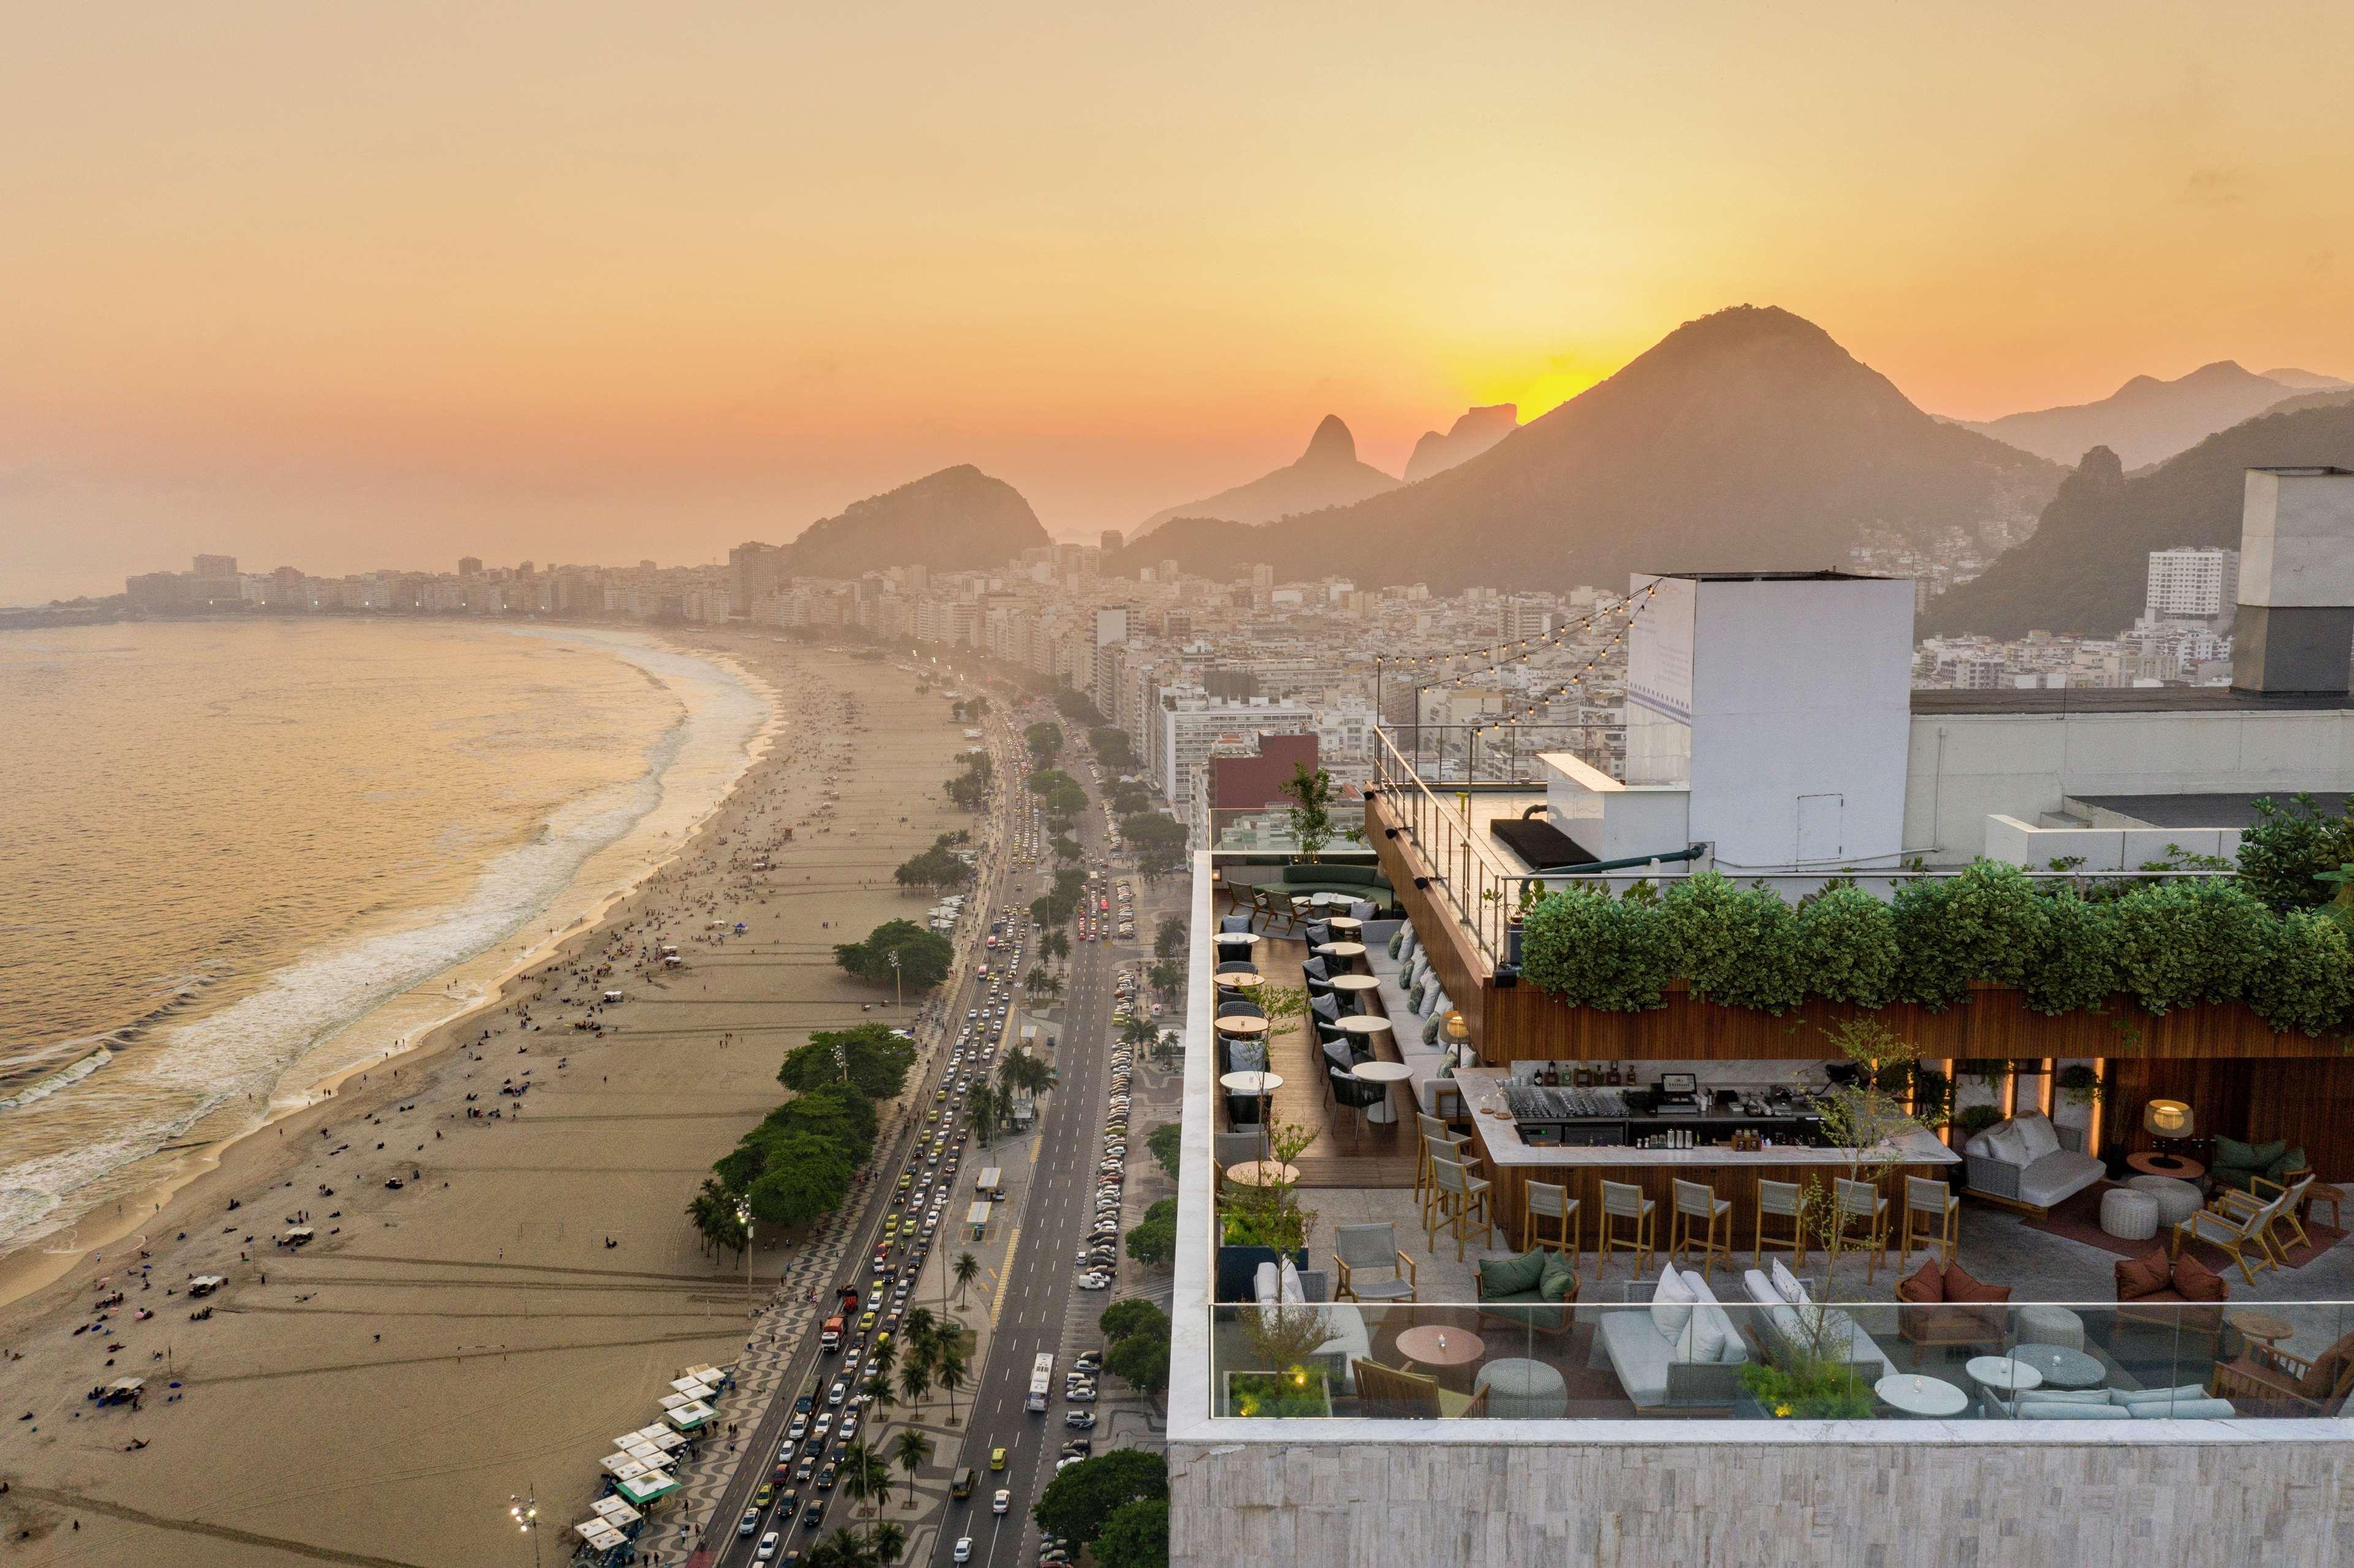 Hilton Rio de Janeiro Copacabana, Rio de Janeiro